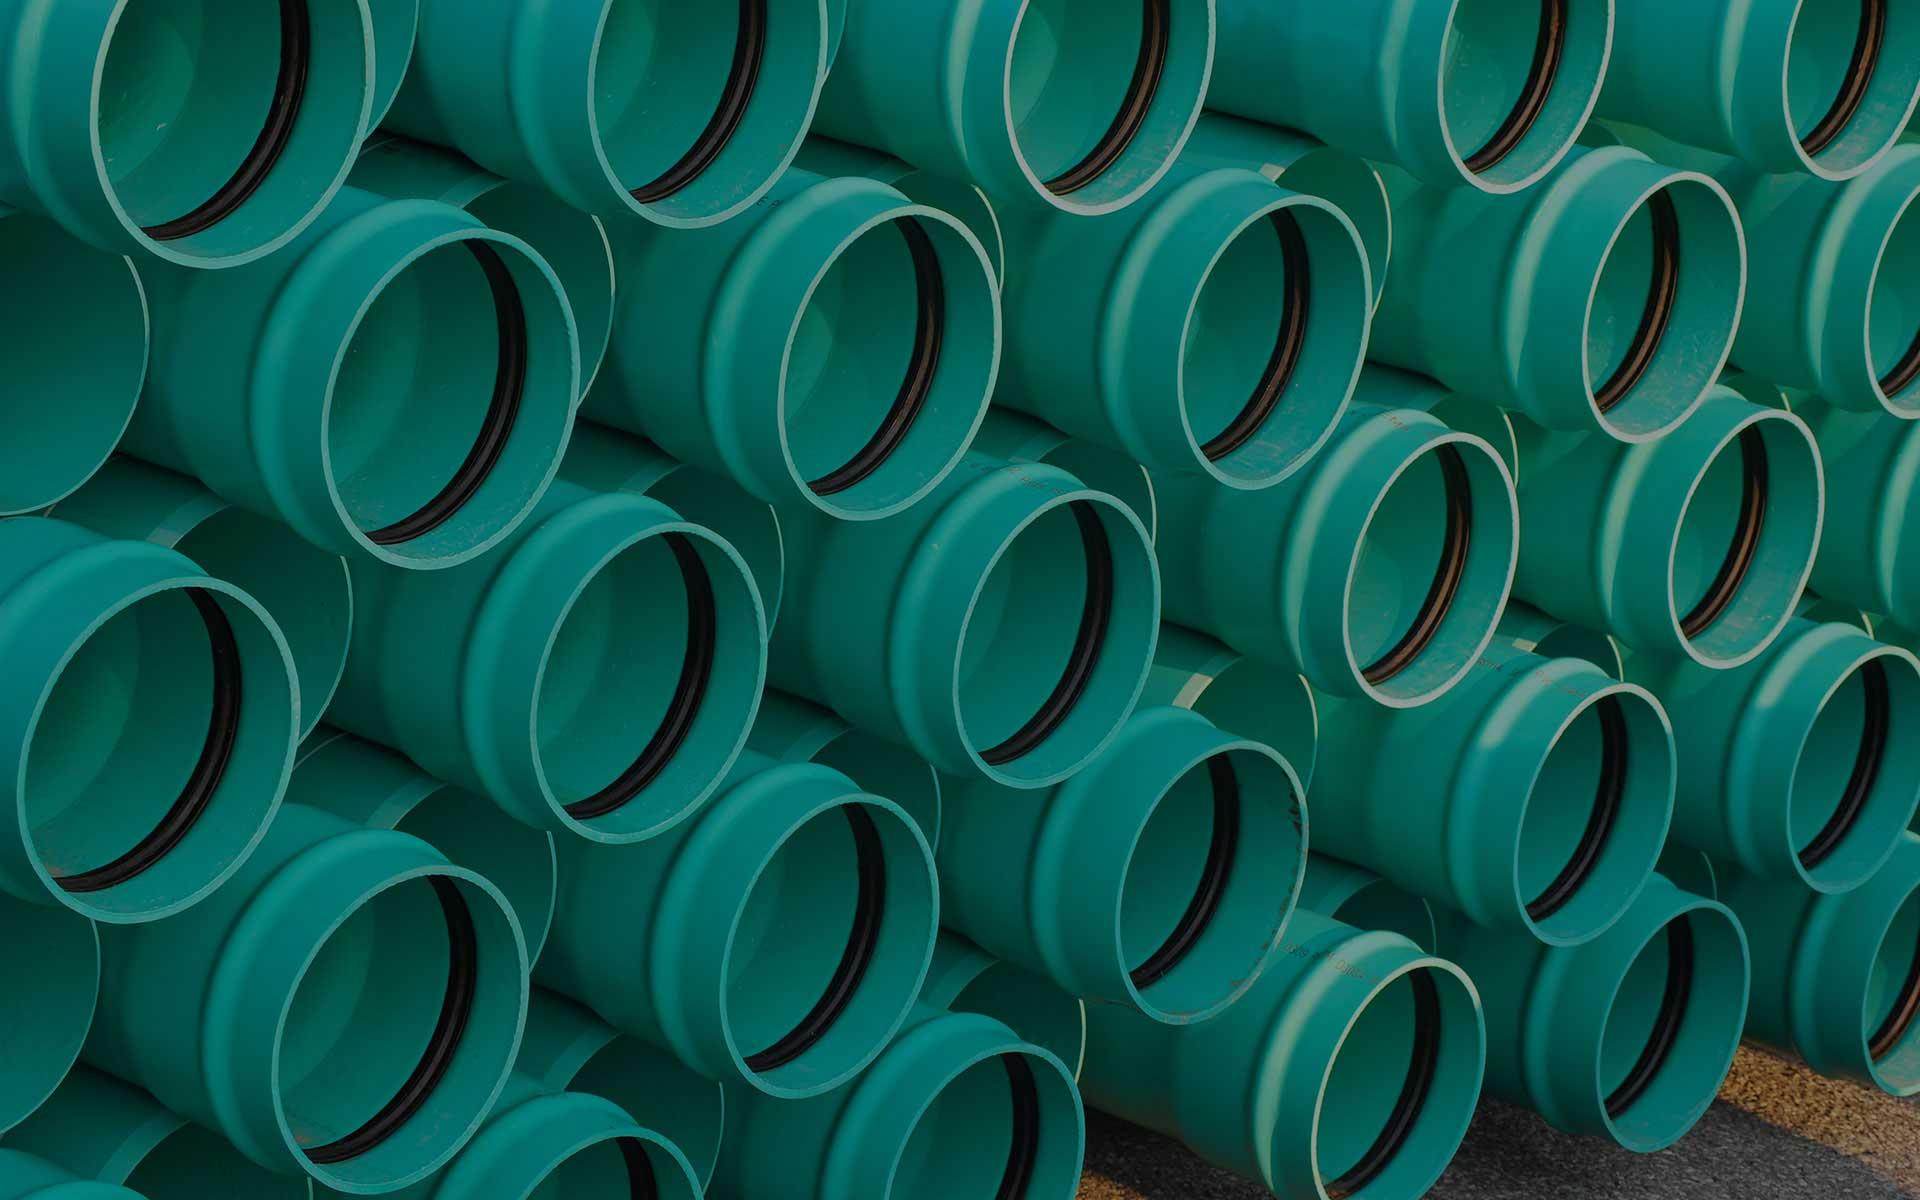 Glendale Sewer Service